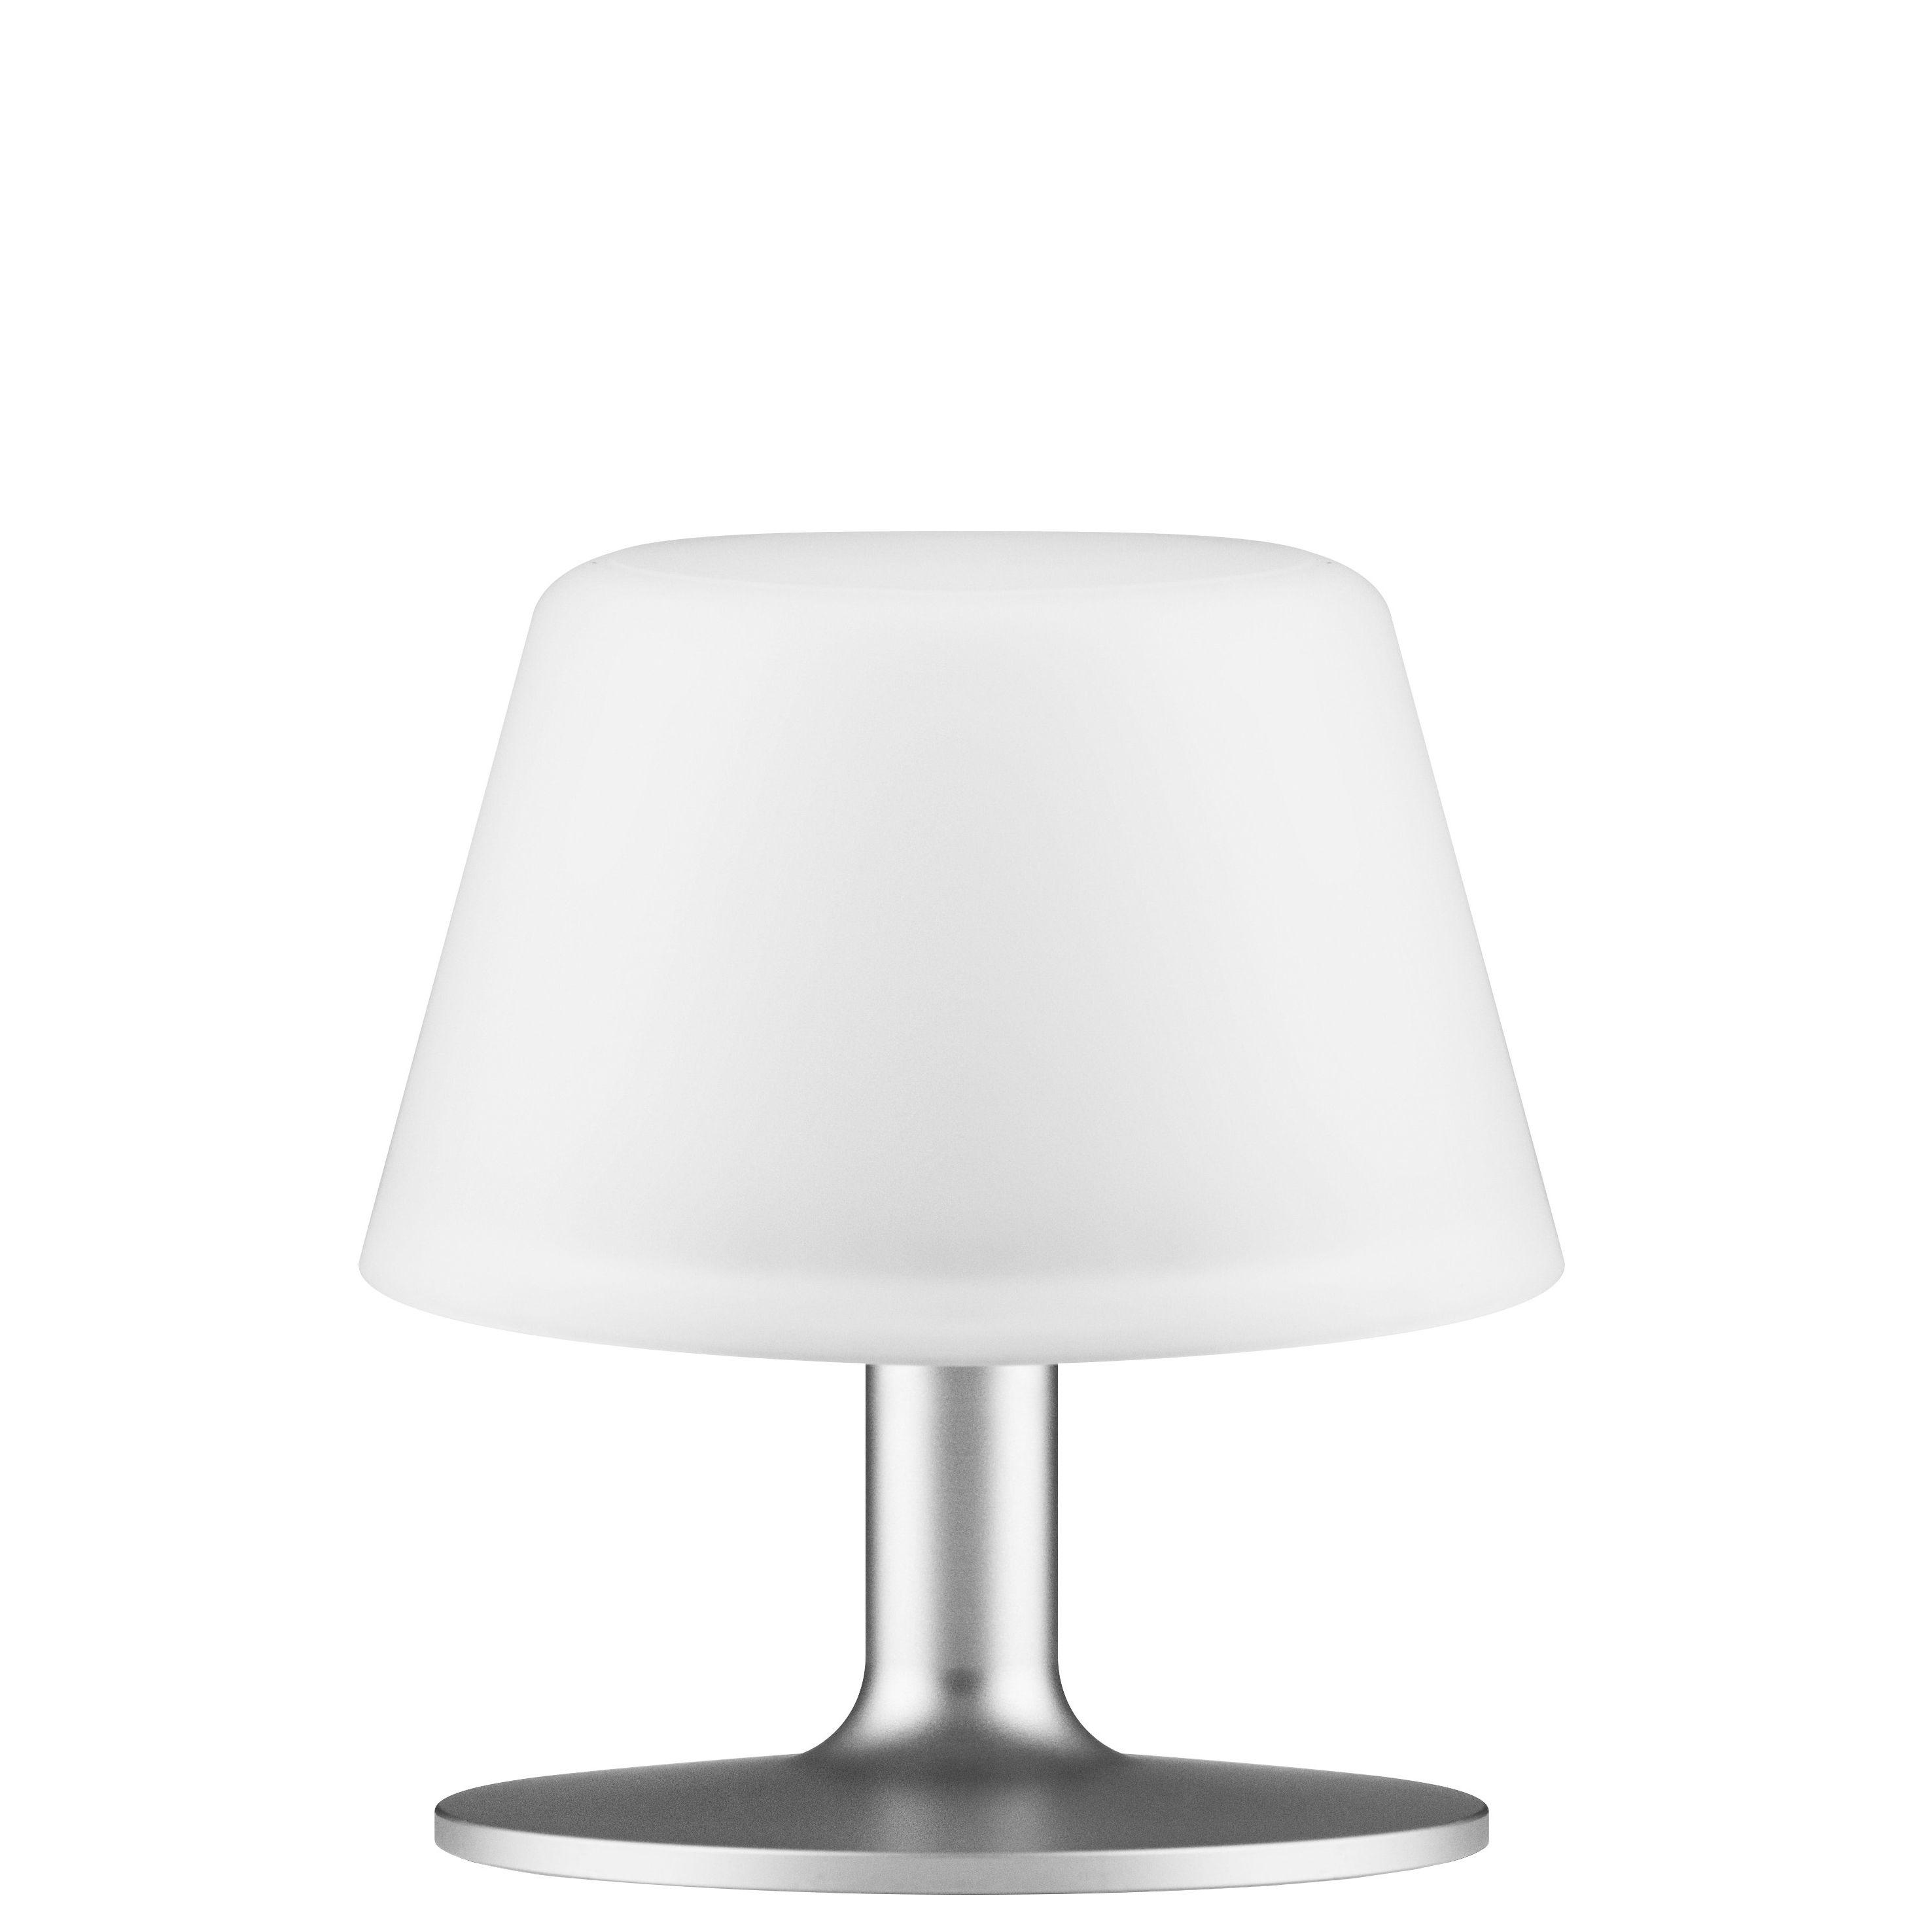 Leuchten - Tischleuchten - Sunlight Small Solarlampe / Solarbetrieb - kabellos - Eva Solo - Small - Weiß & Fuß grau - eloxiertes Aluminium, Verre dépoli